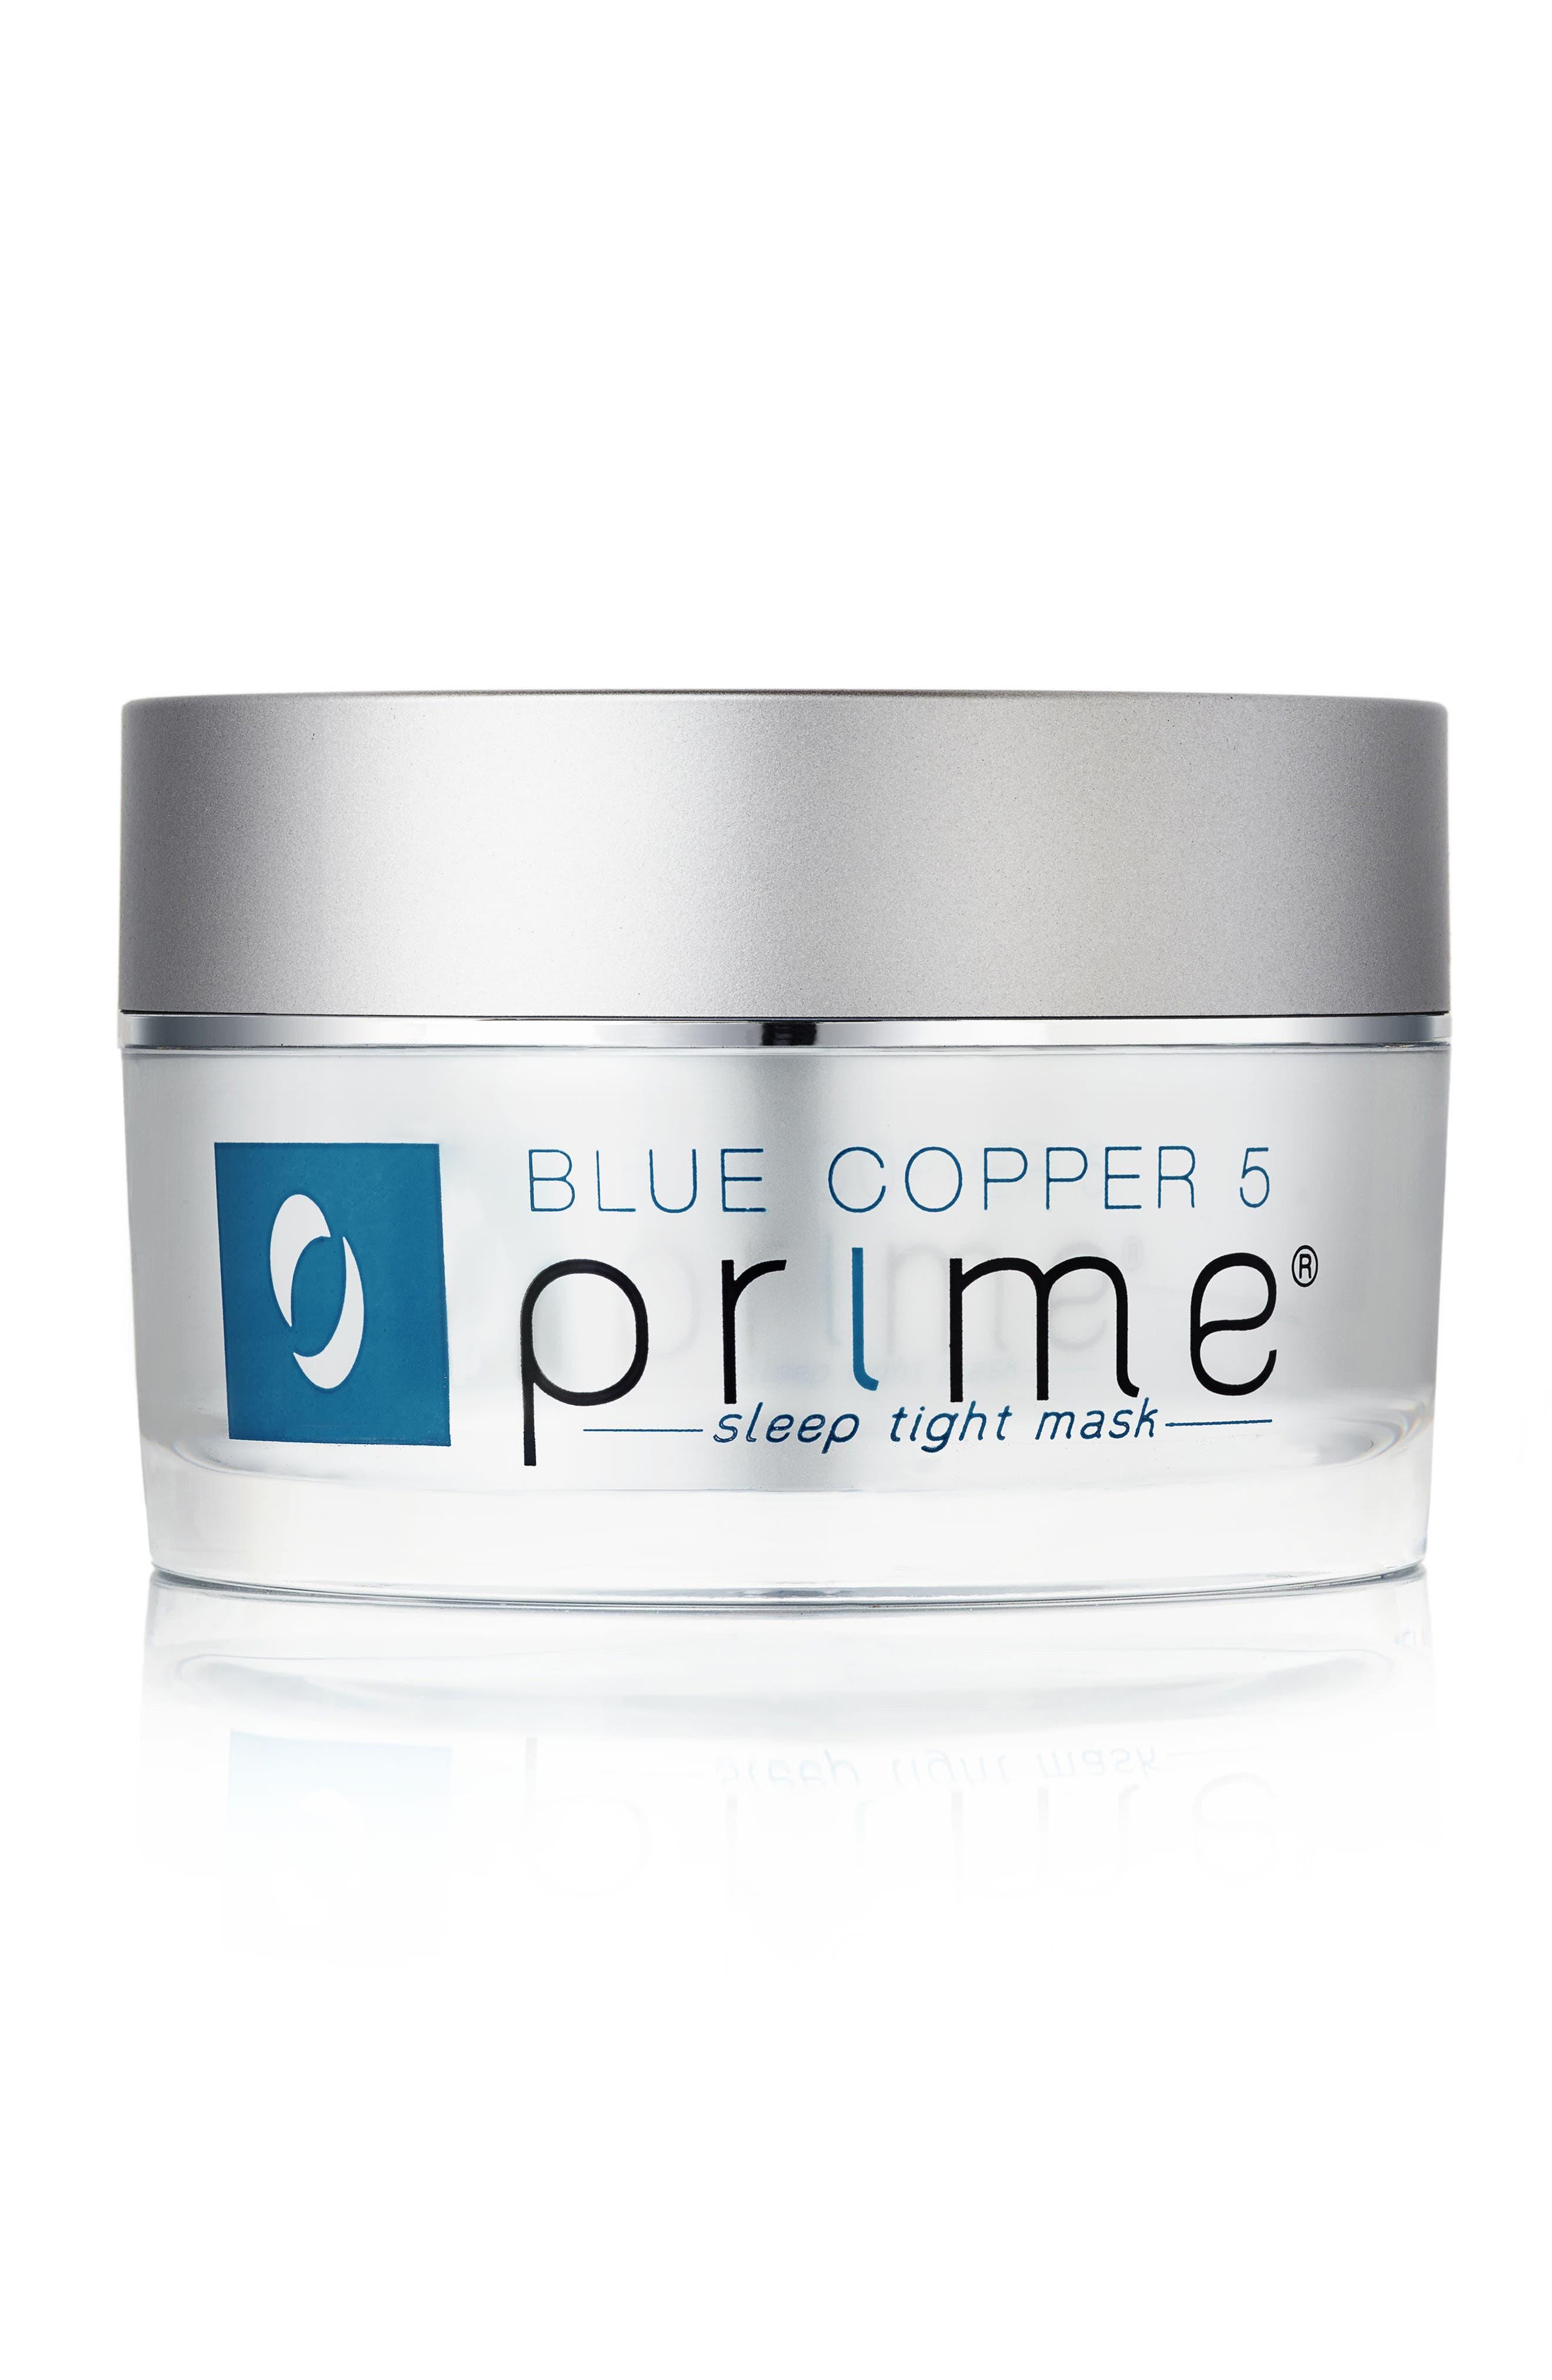 Blue Copper 5 Prime<sup>®</sup> Sleep Tight Mask,                             Main thumbnail 1, color,                             NO COLOR